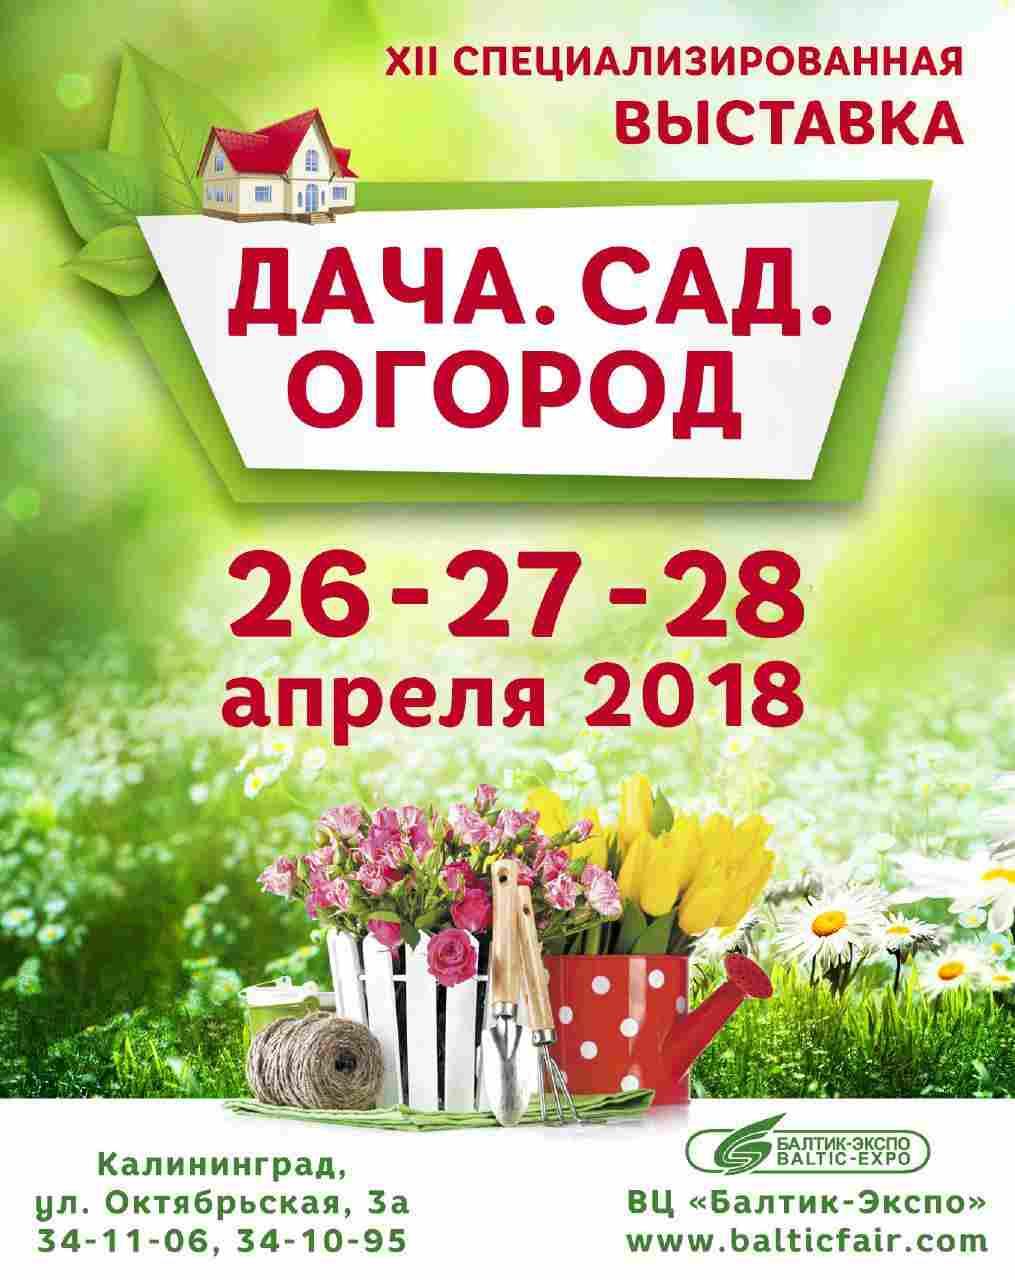 Выставка Дача. Сад. Огород 2018